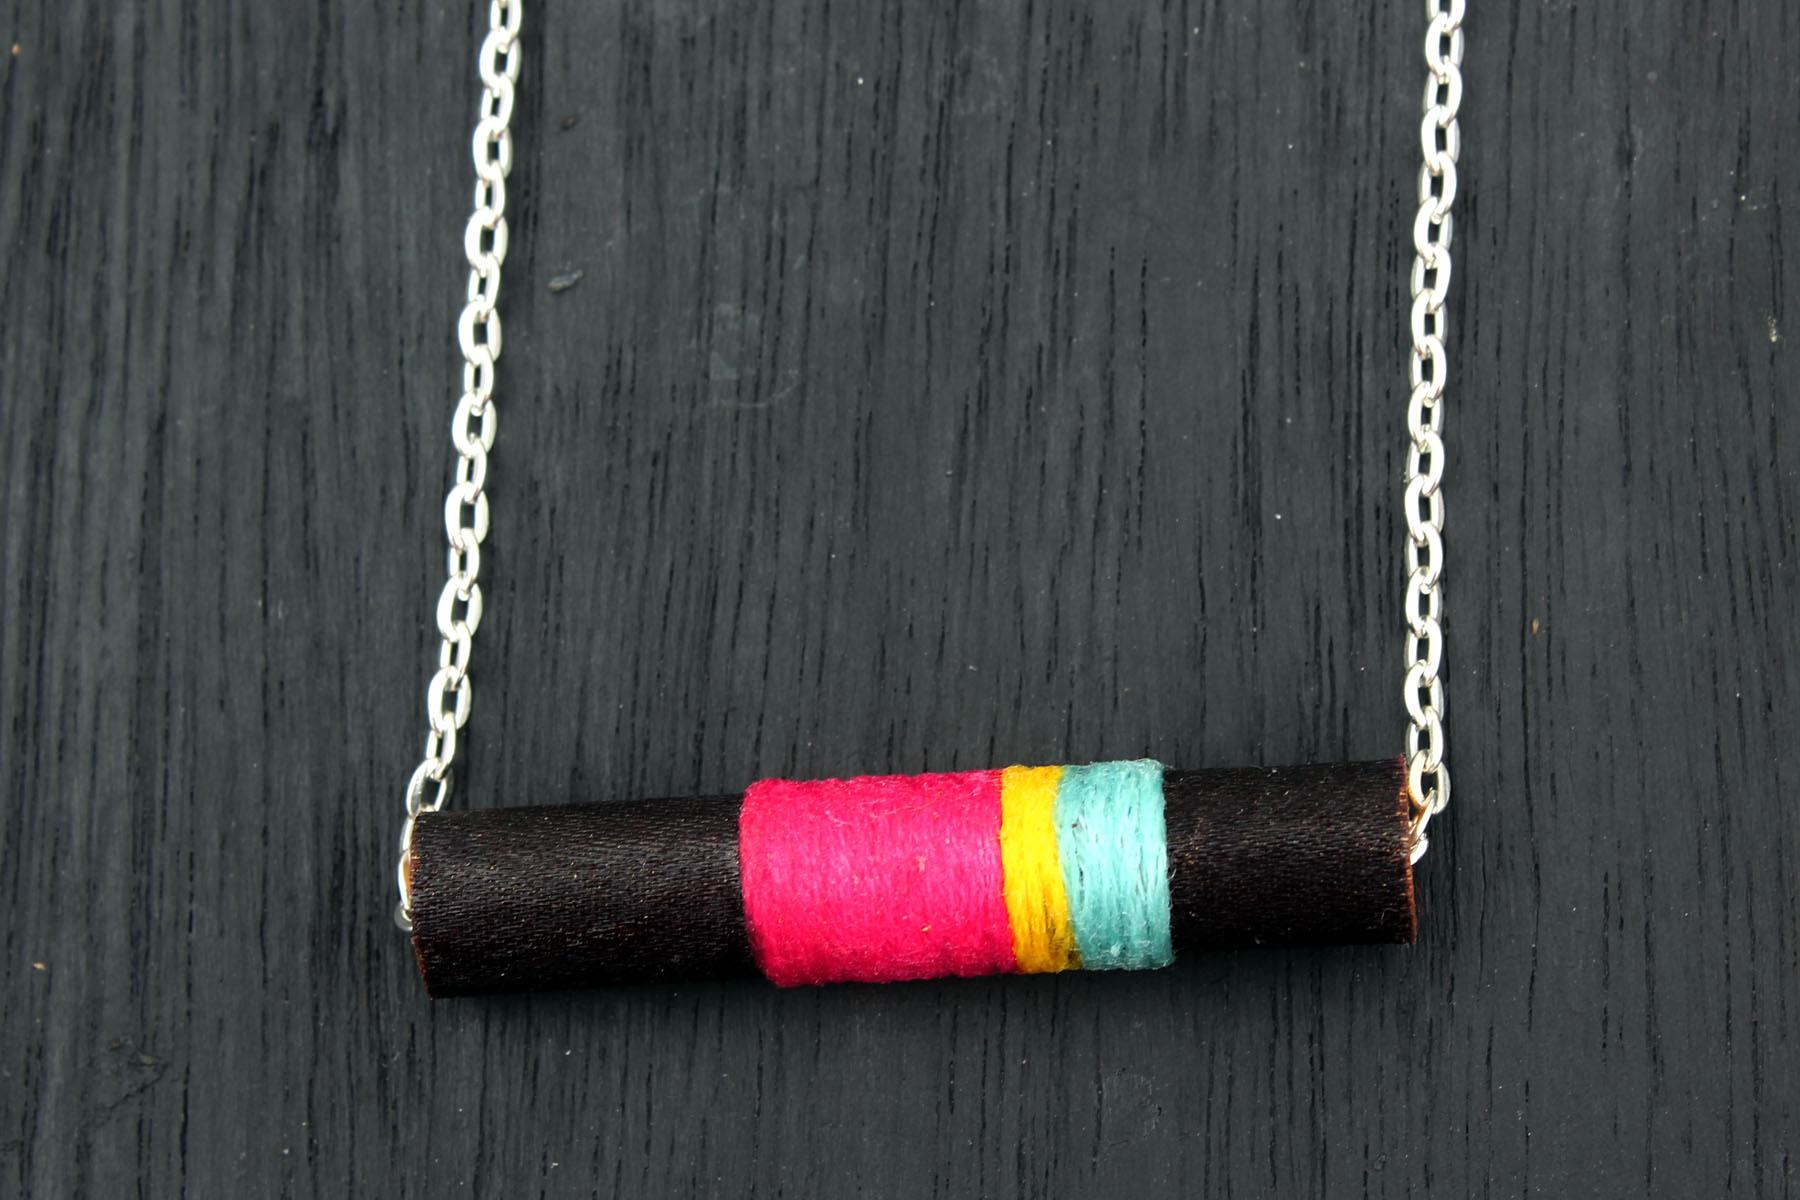 Cinnamon-Inspired DIY Necklace